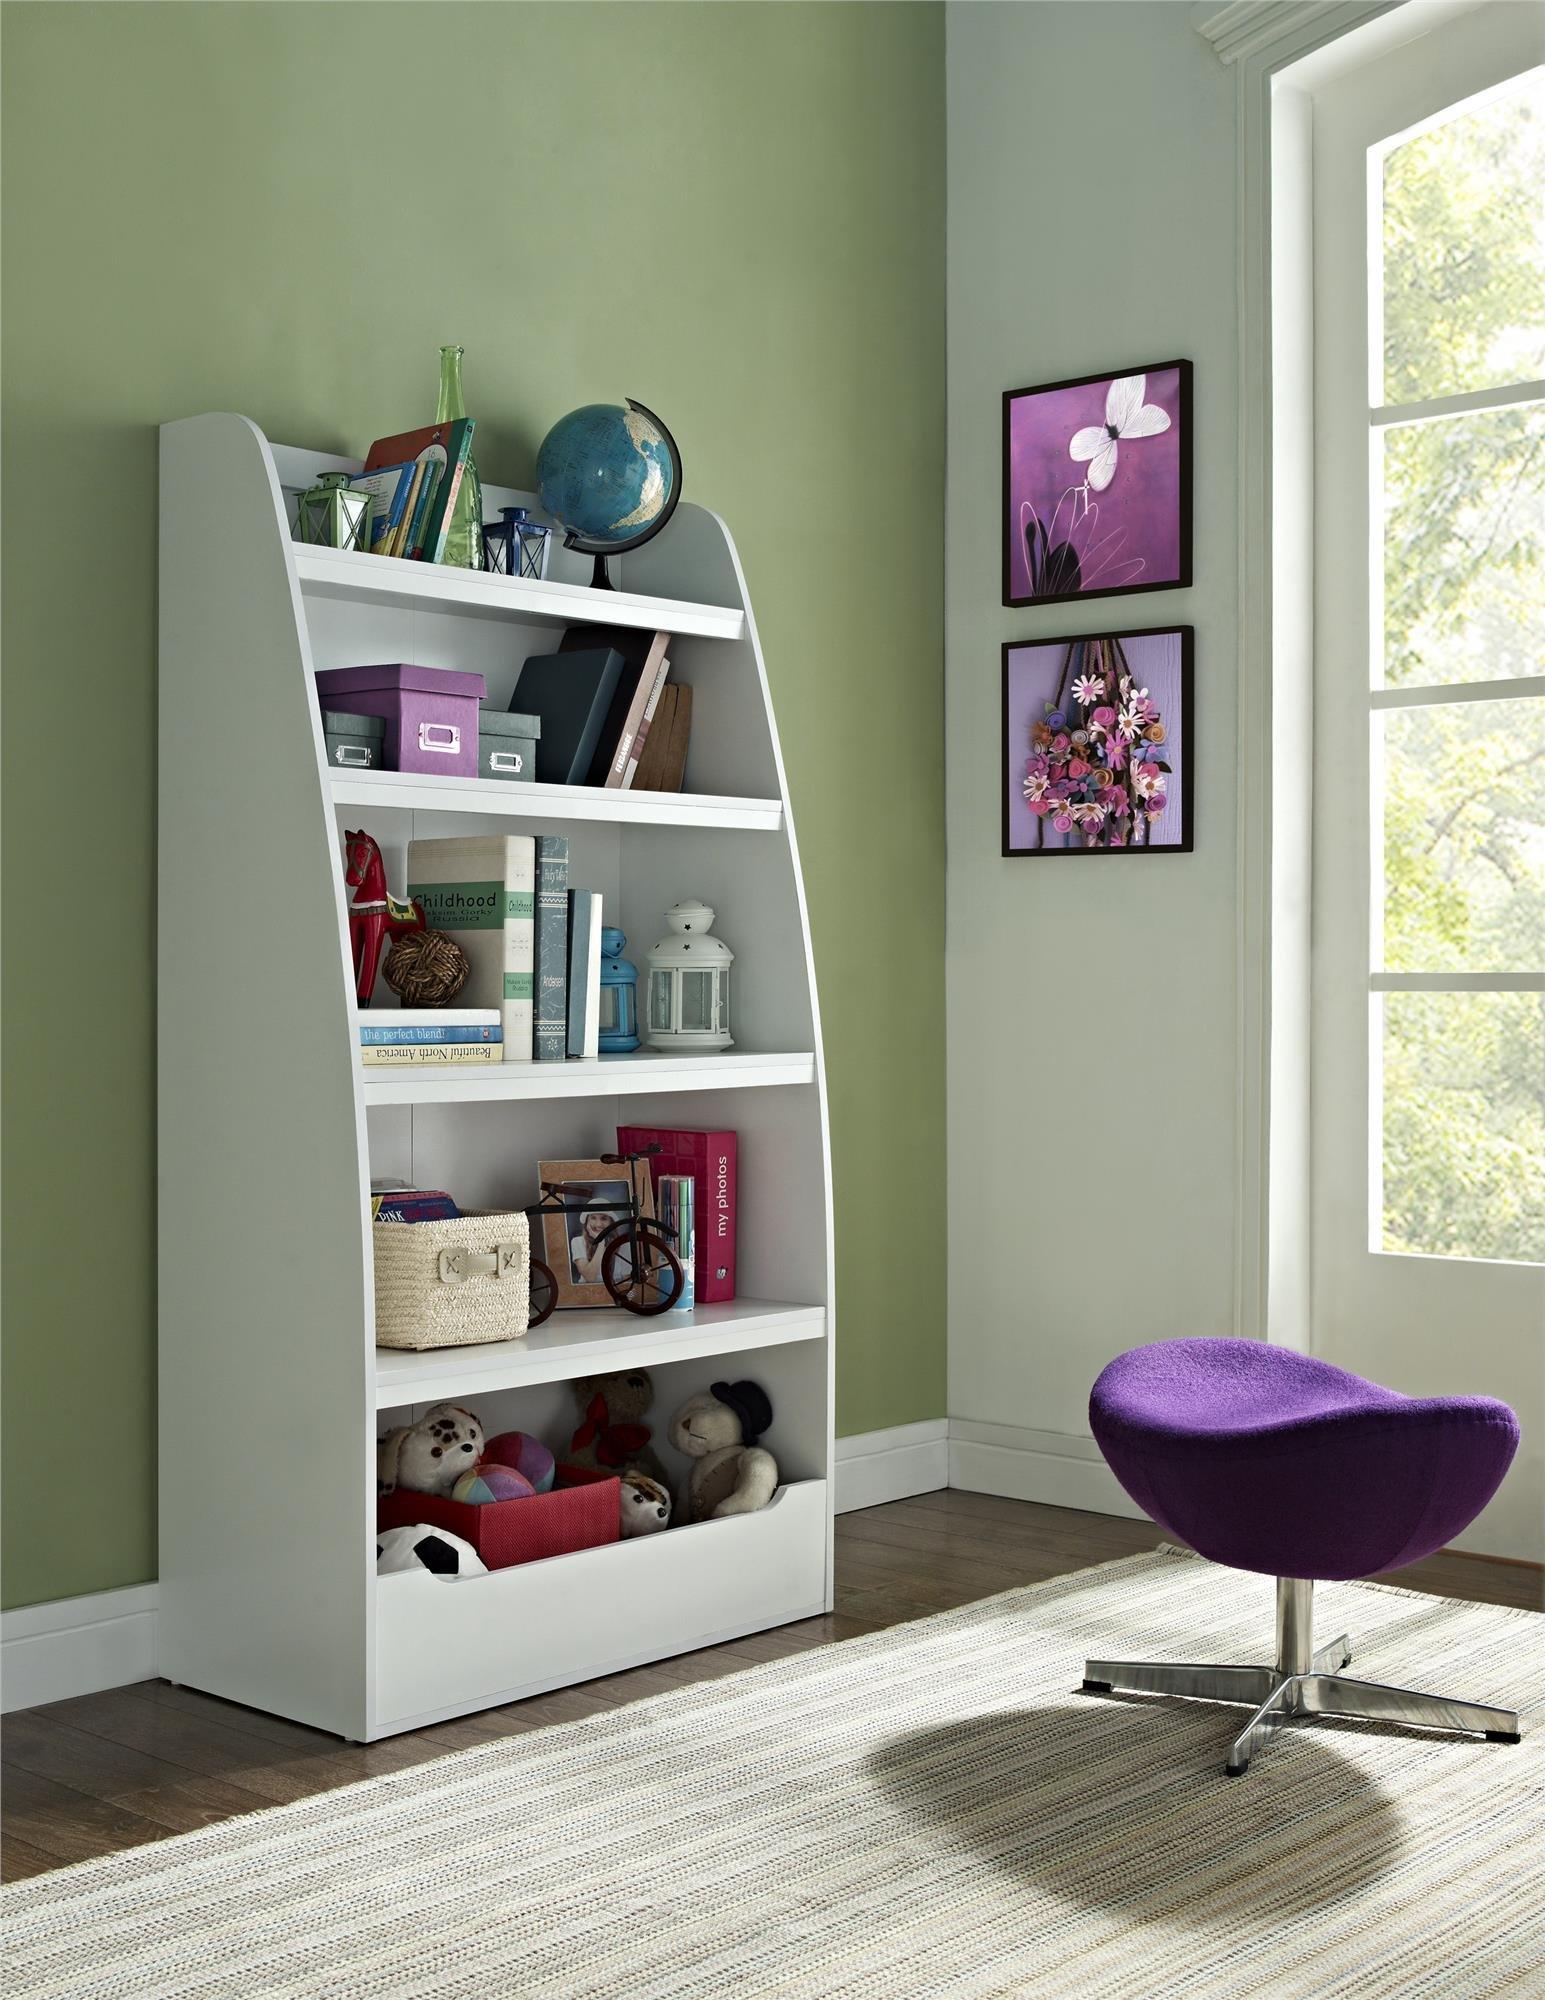 Ameriwood Home Hazel Kids' 4 Shelf Bookcase, White by Ameriwood Home